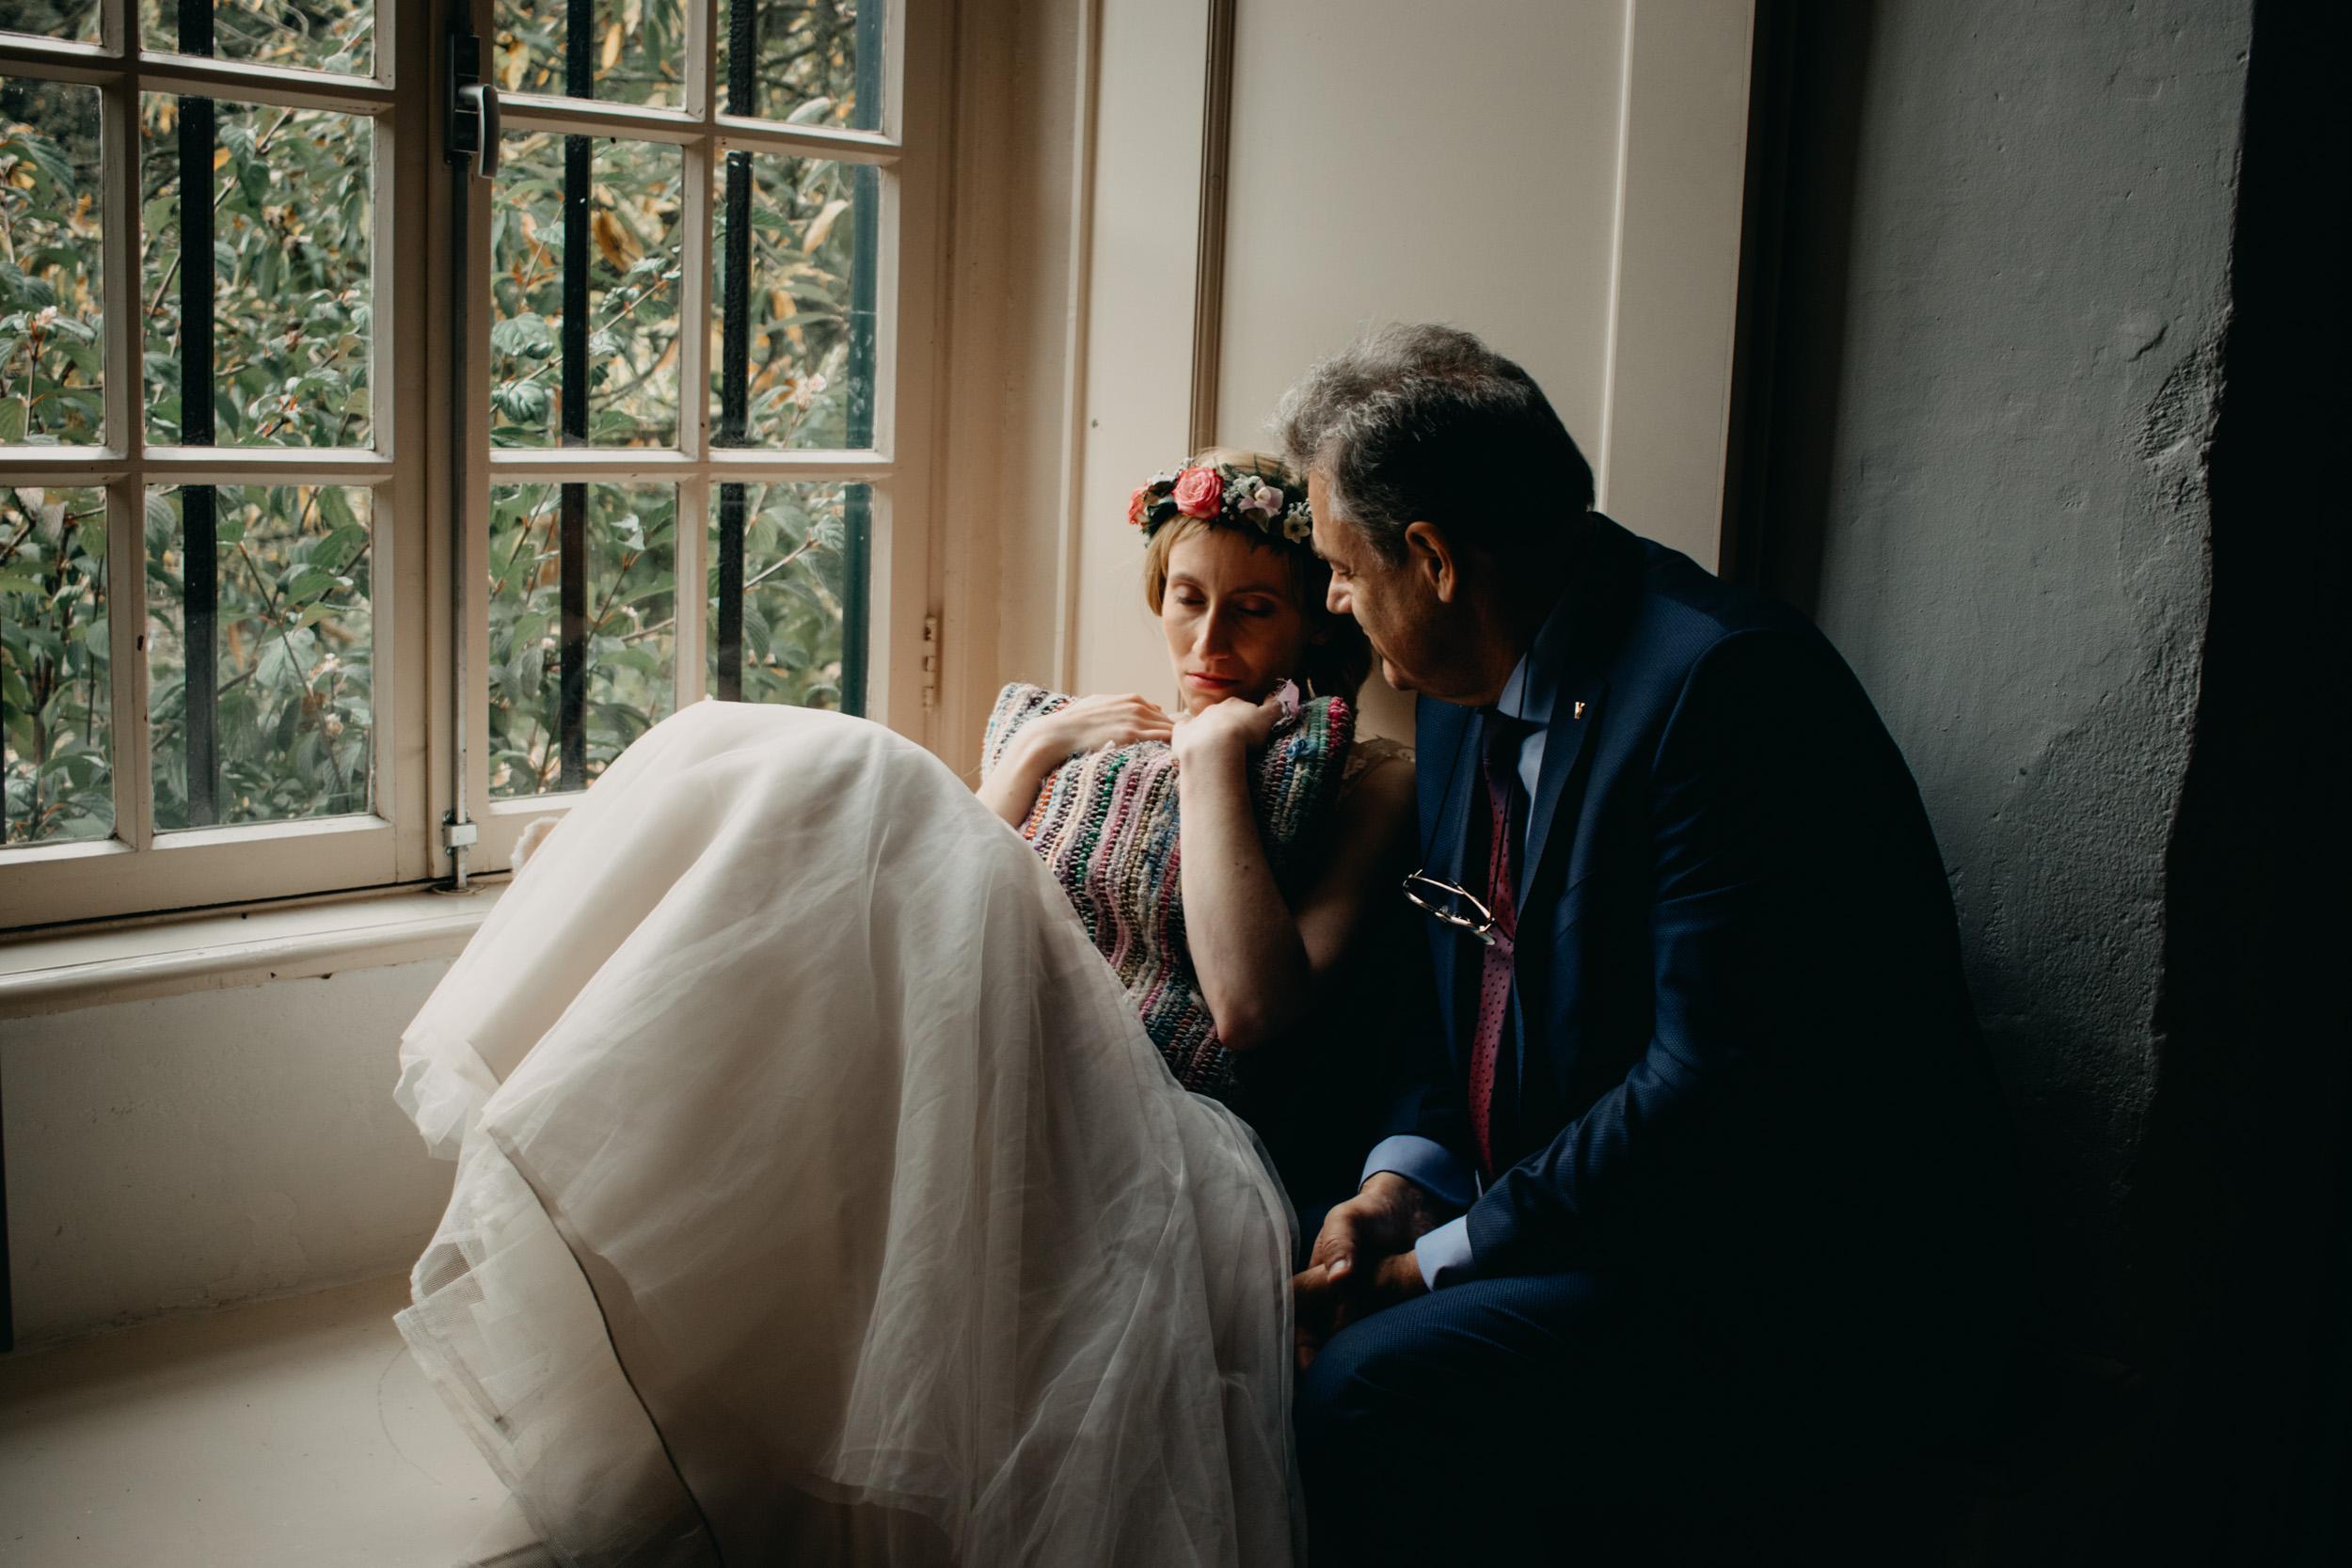 herfst-bruiloft-slot-doddendael-trouwen-kanker